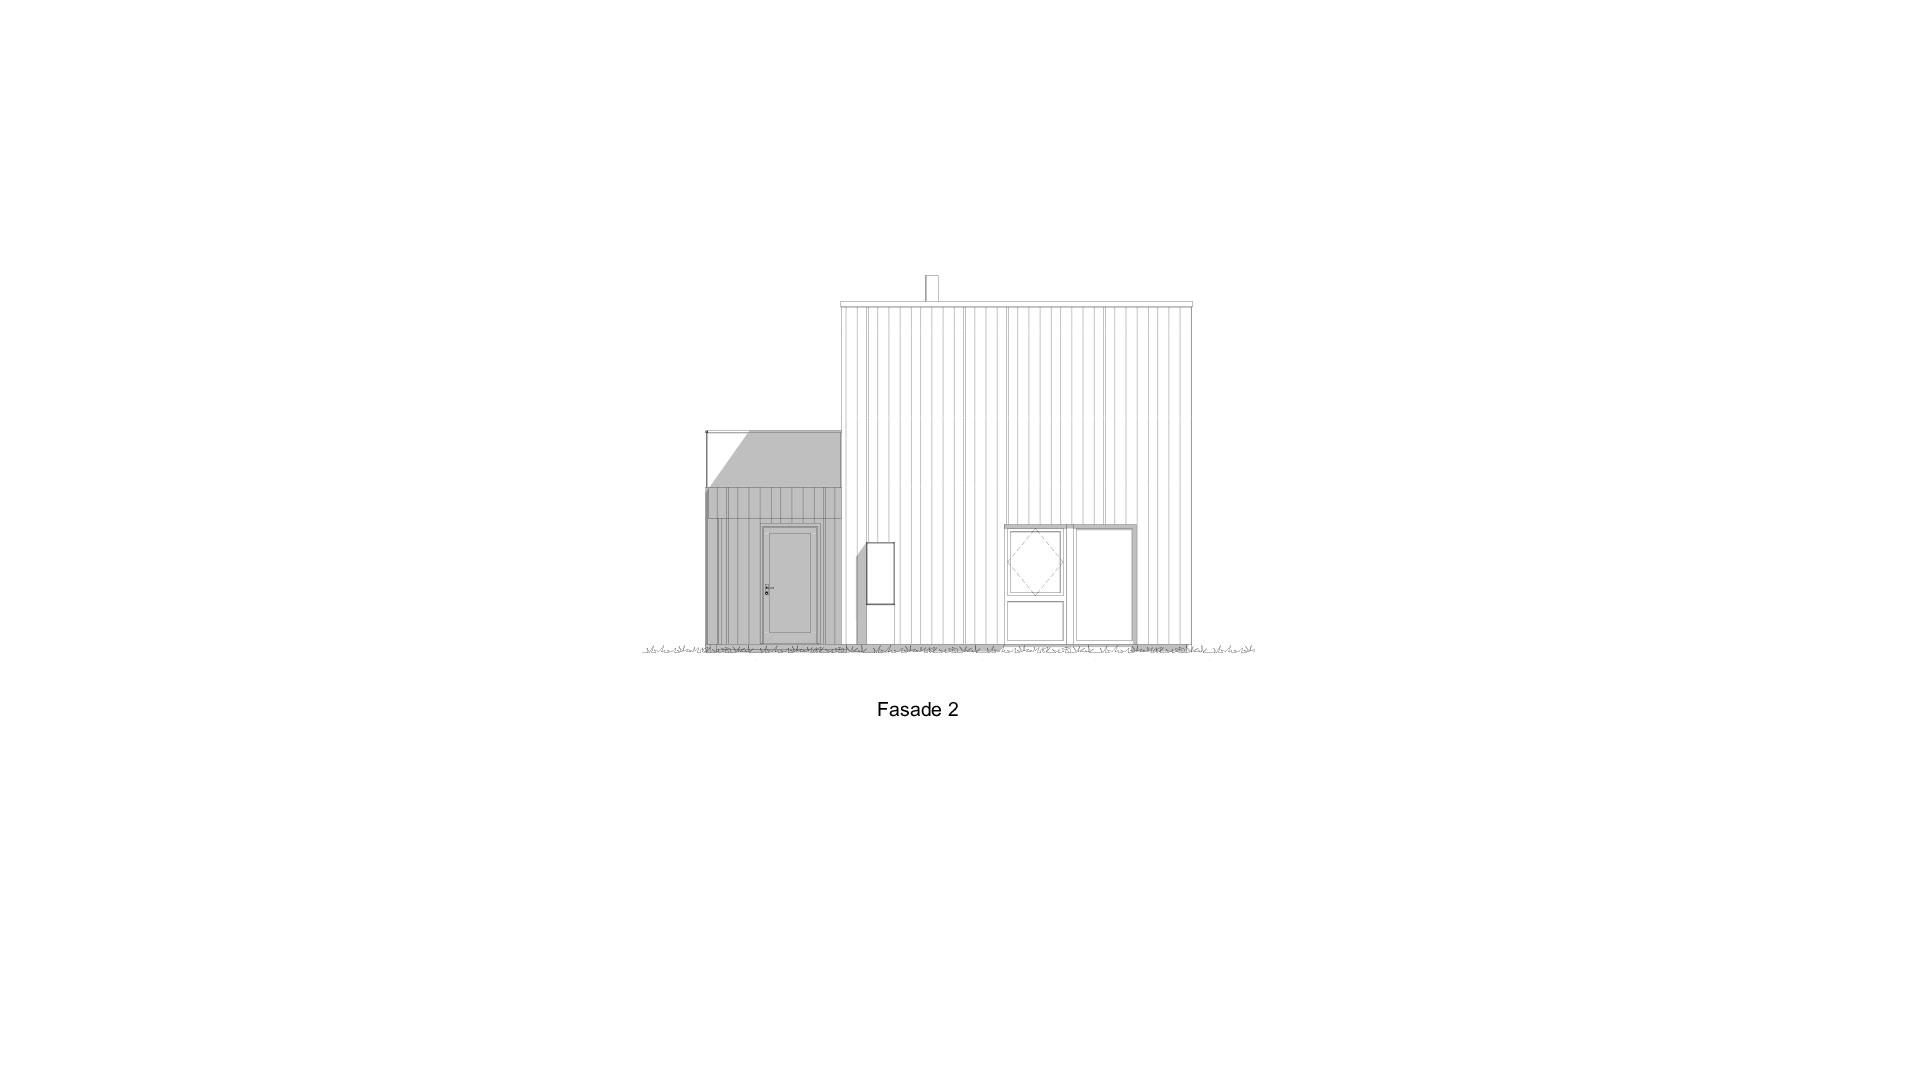 DrapenModerne_Fasade2.jpg